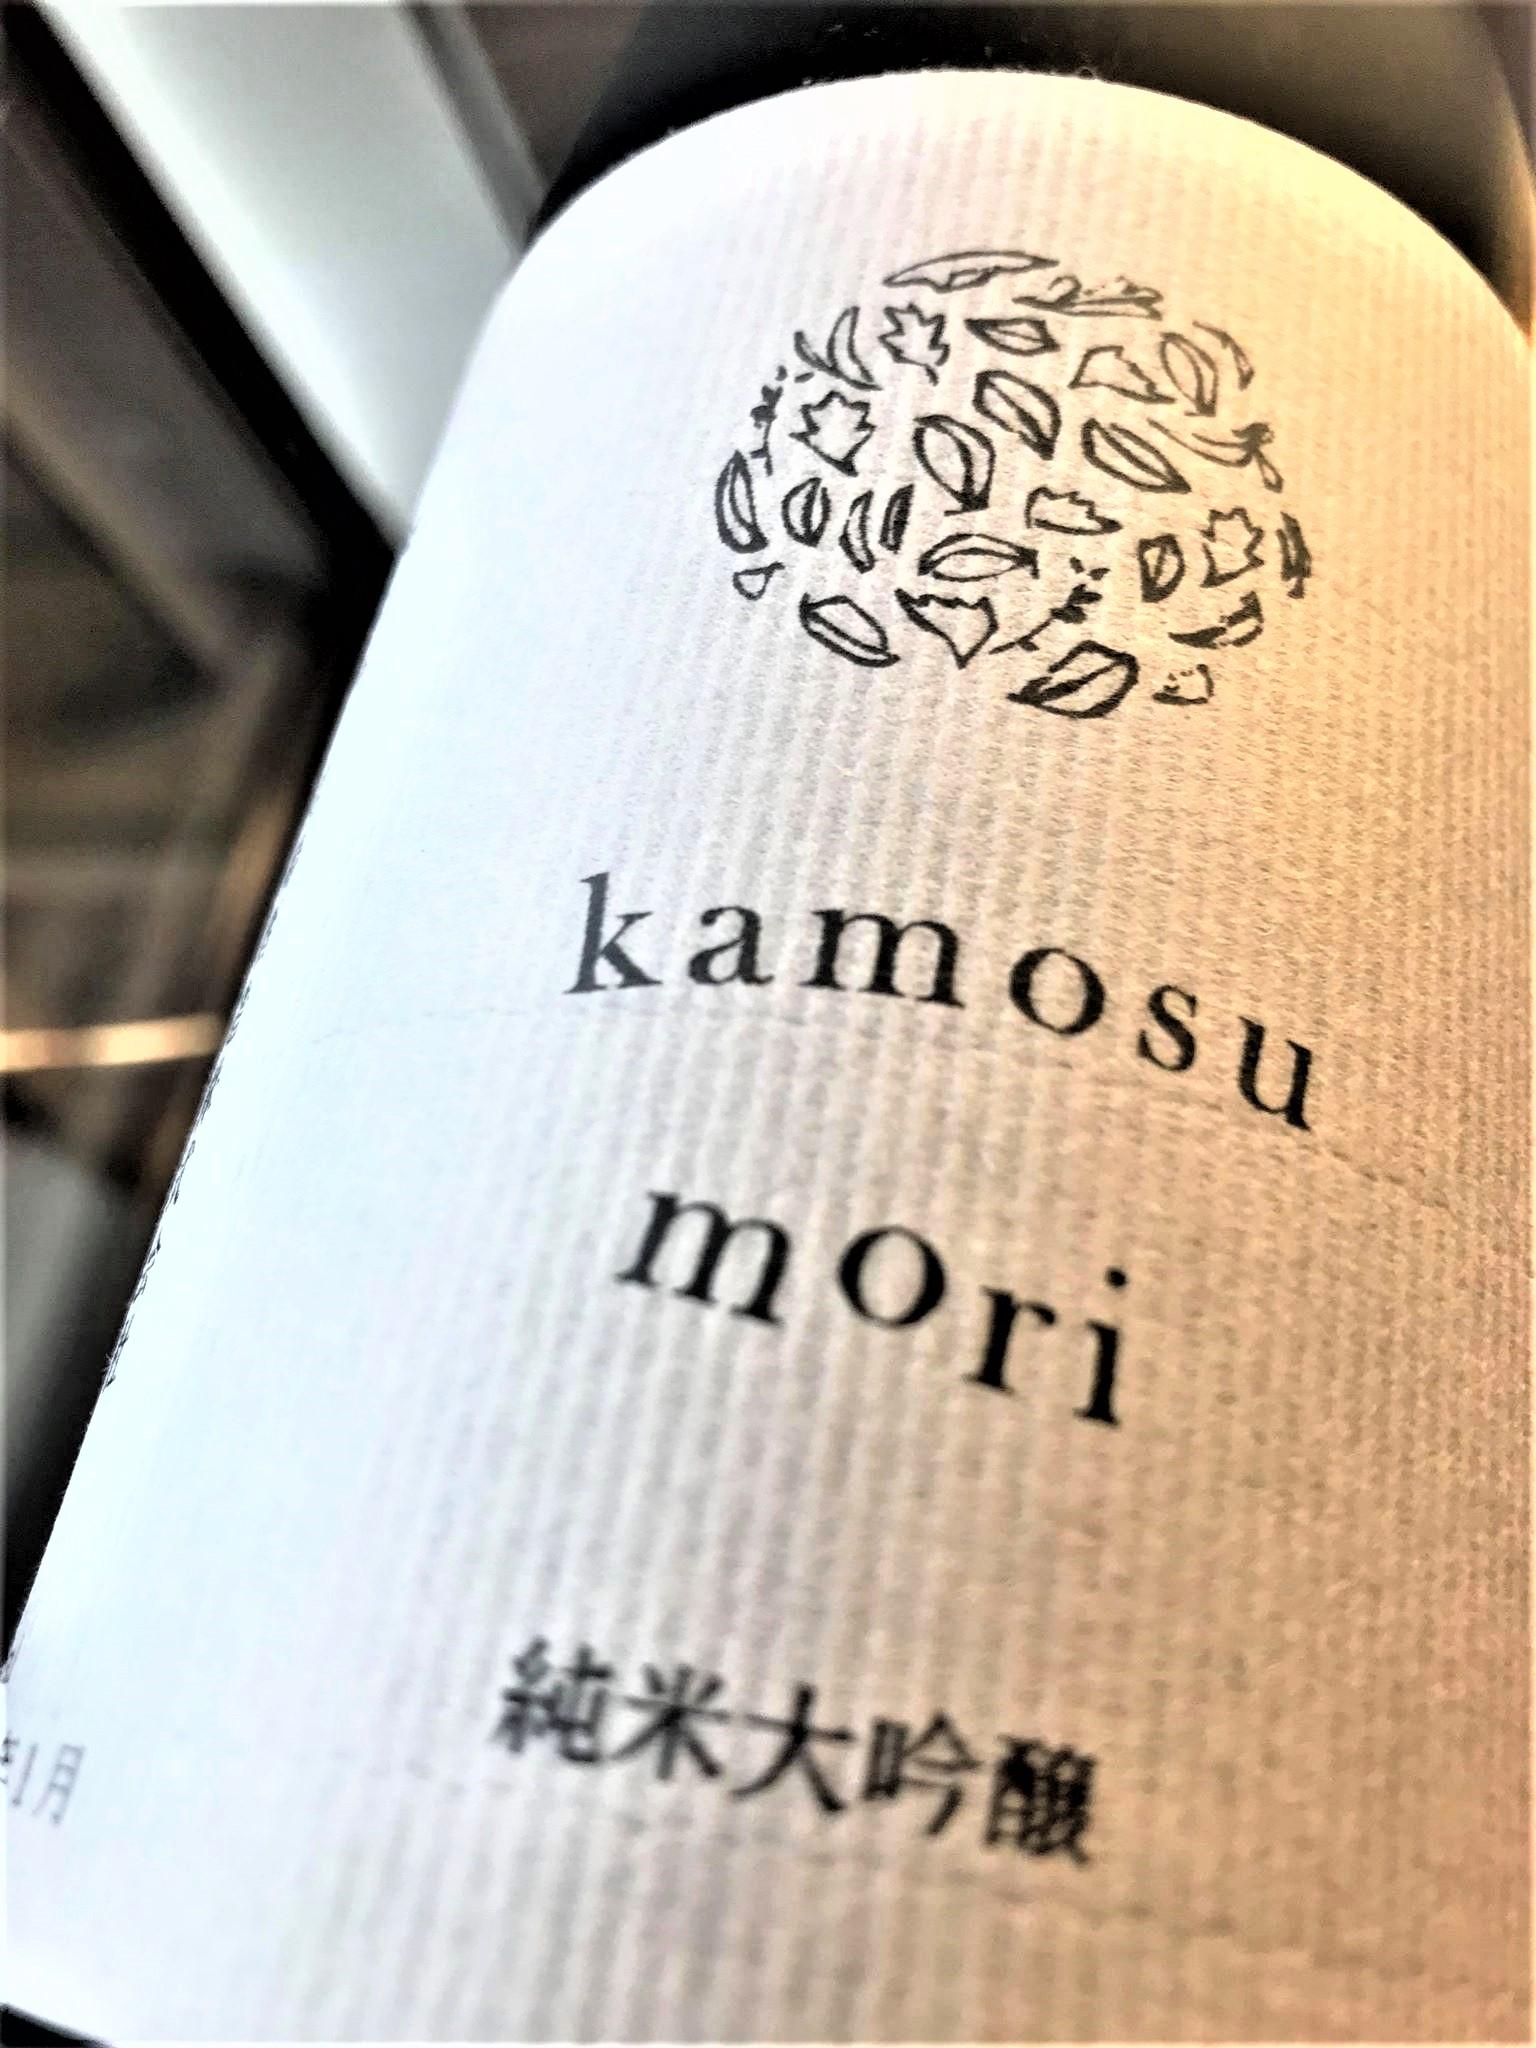 【日本酒】醸す森『kamosu mori』純米大吟醸生酒 五百万石50磨き 蔵元特別限定蔵出し 令和1BY🆕_e0173738_1538736.jpg